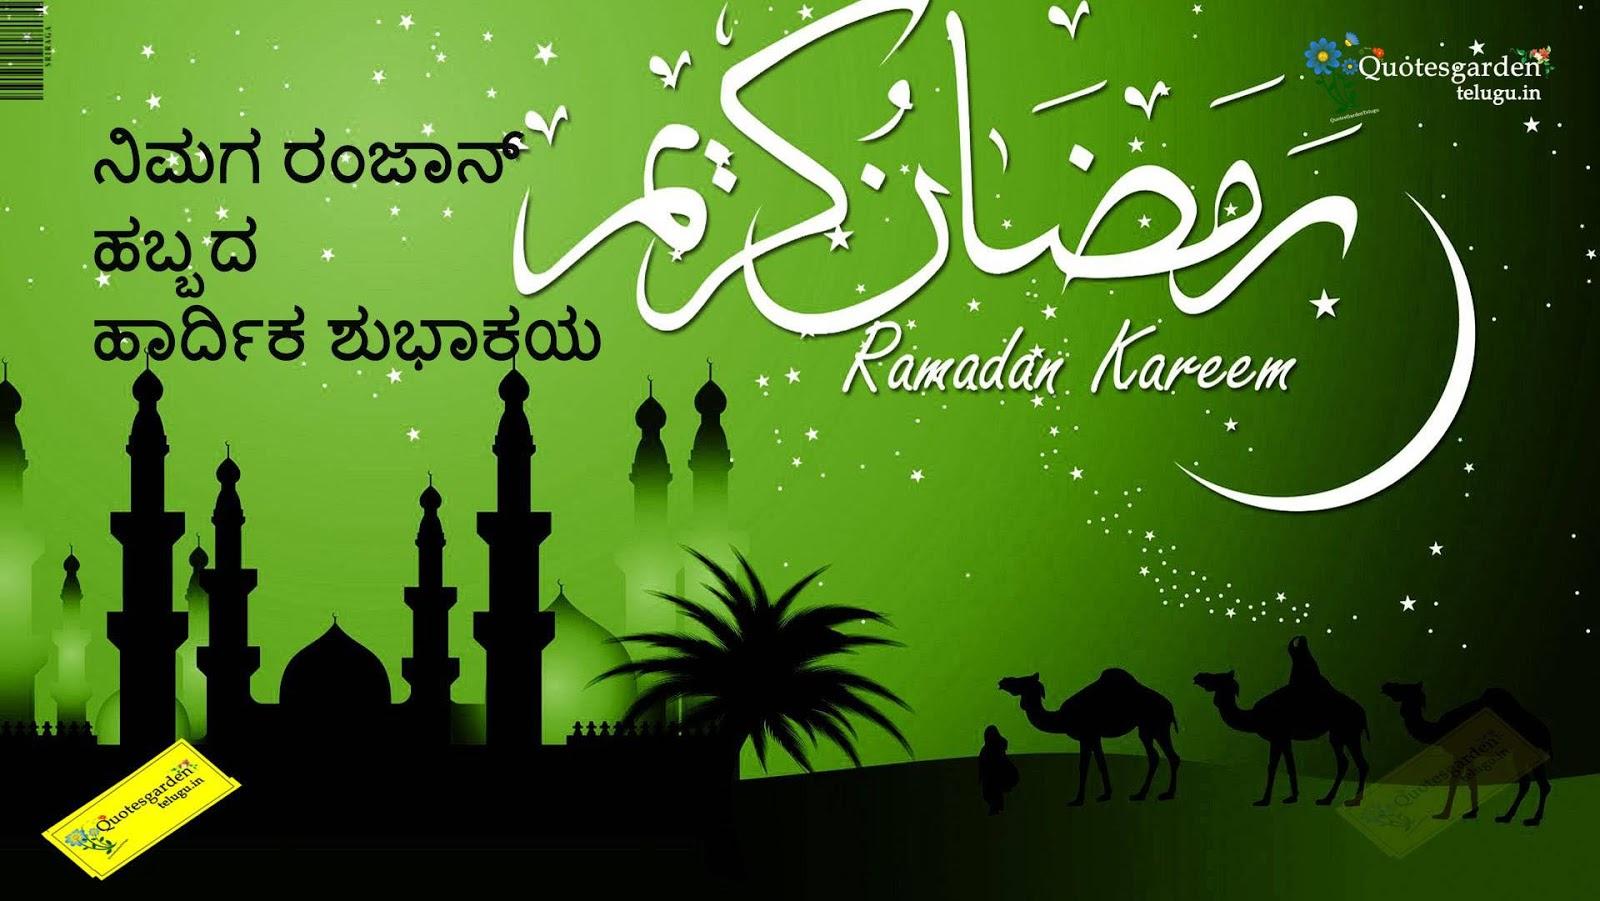 Best kannada ramzan greetings eid mubarak wishes pictures photoes best kannada ramzan greetings eid mubarak wishes pictures photoes images wallpapers kristyandbryce Images